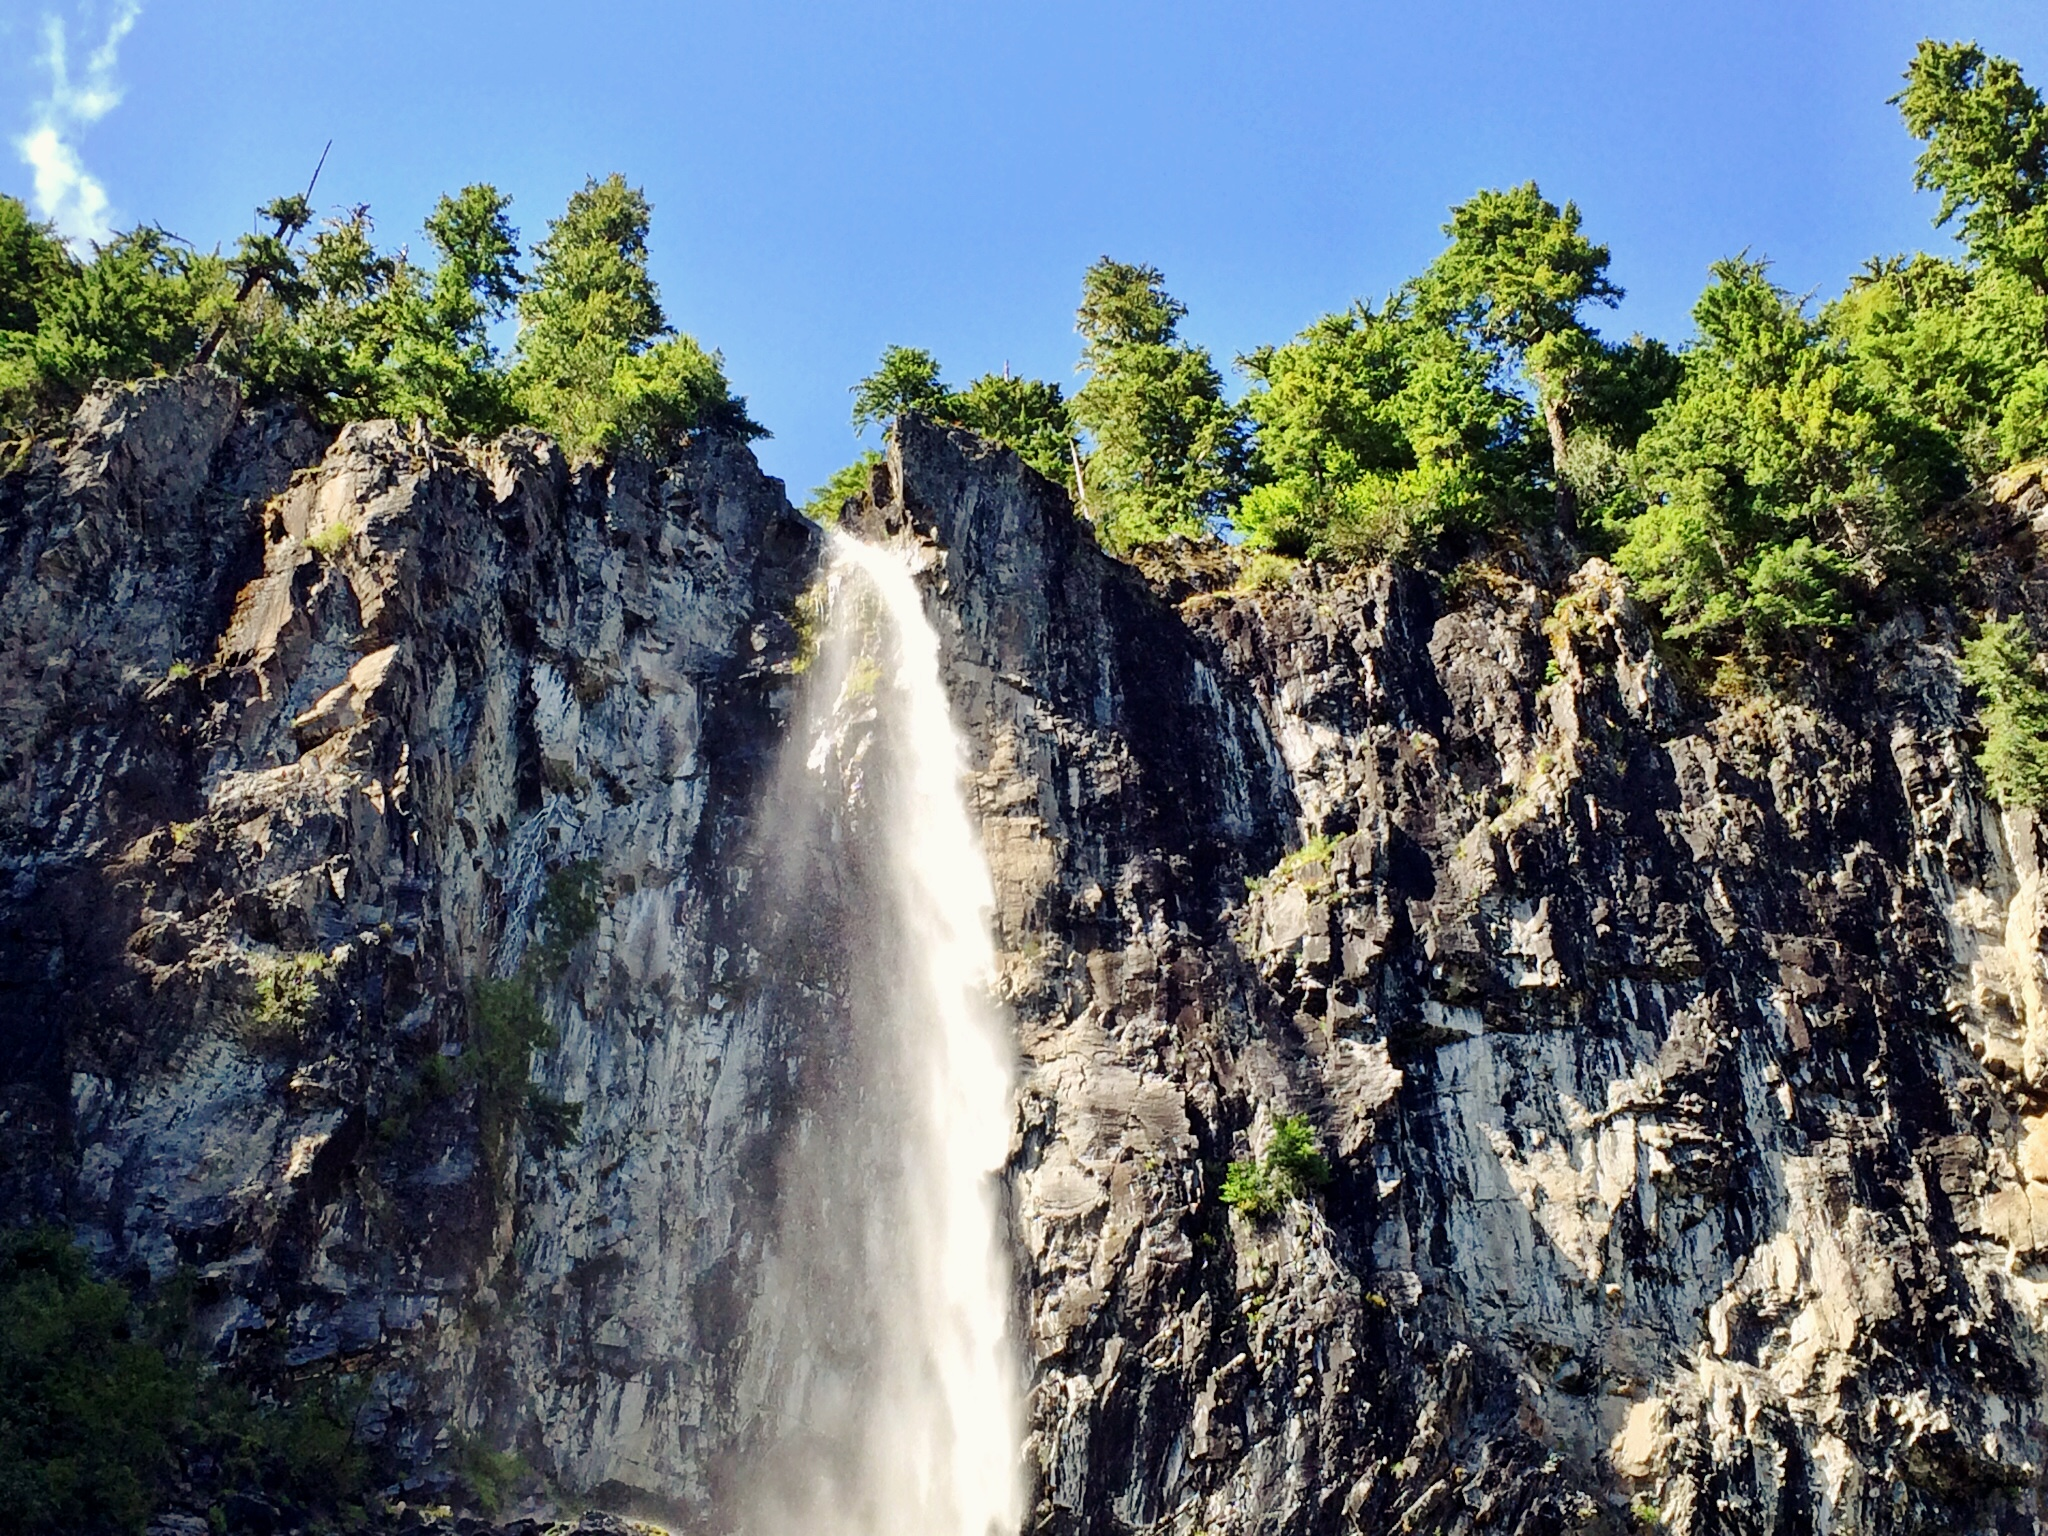 Snagtooth Falls